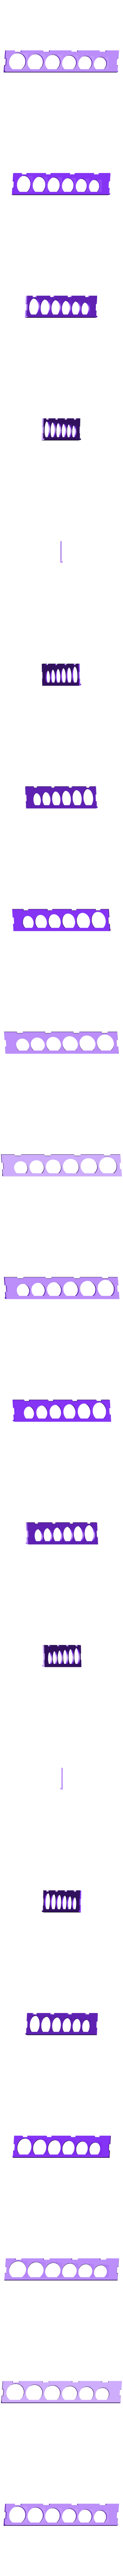 sorter-customizer_topboard20170216-11655-ed7imb-0.stl Download free STL file Auto Coin Sorter for Euro without 1 2¢ • 3D printer design, HeyVye